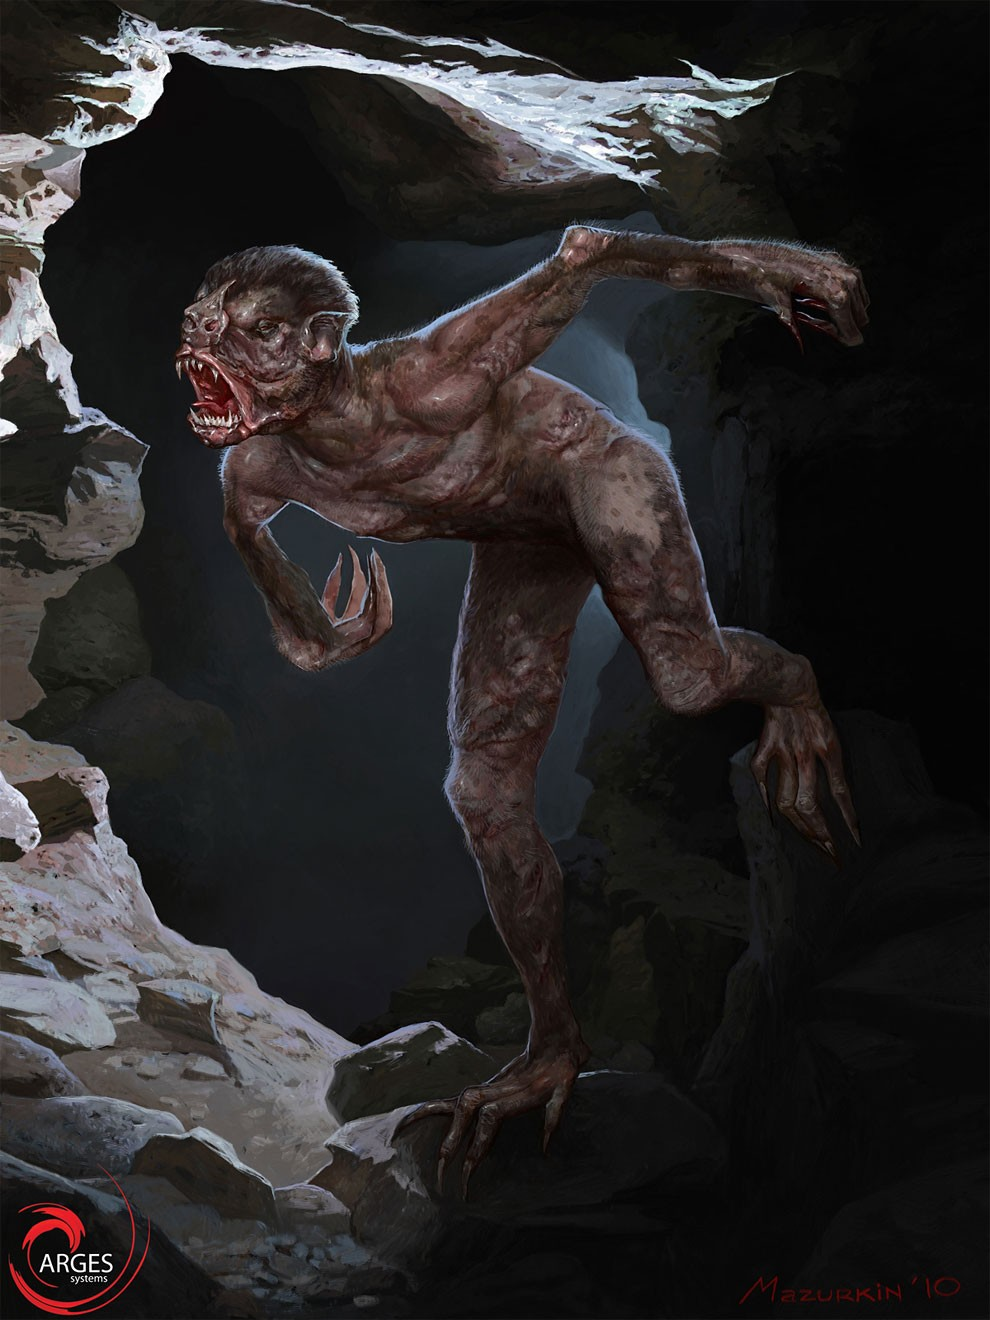 digital-art-dark-fantasy-horror-yuriy-mazurkin-18